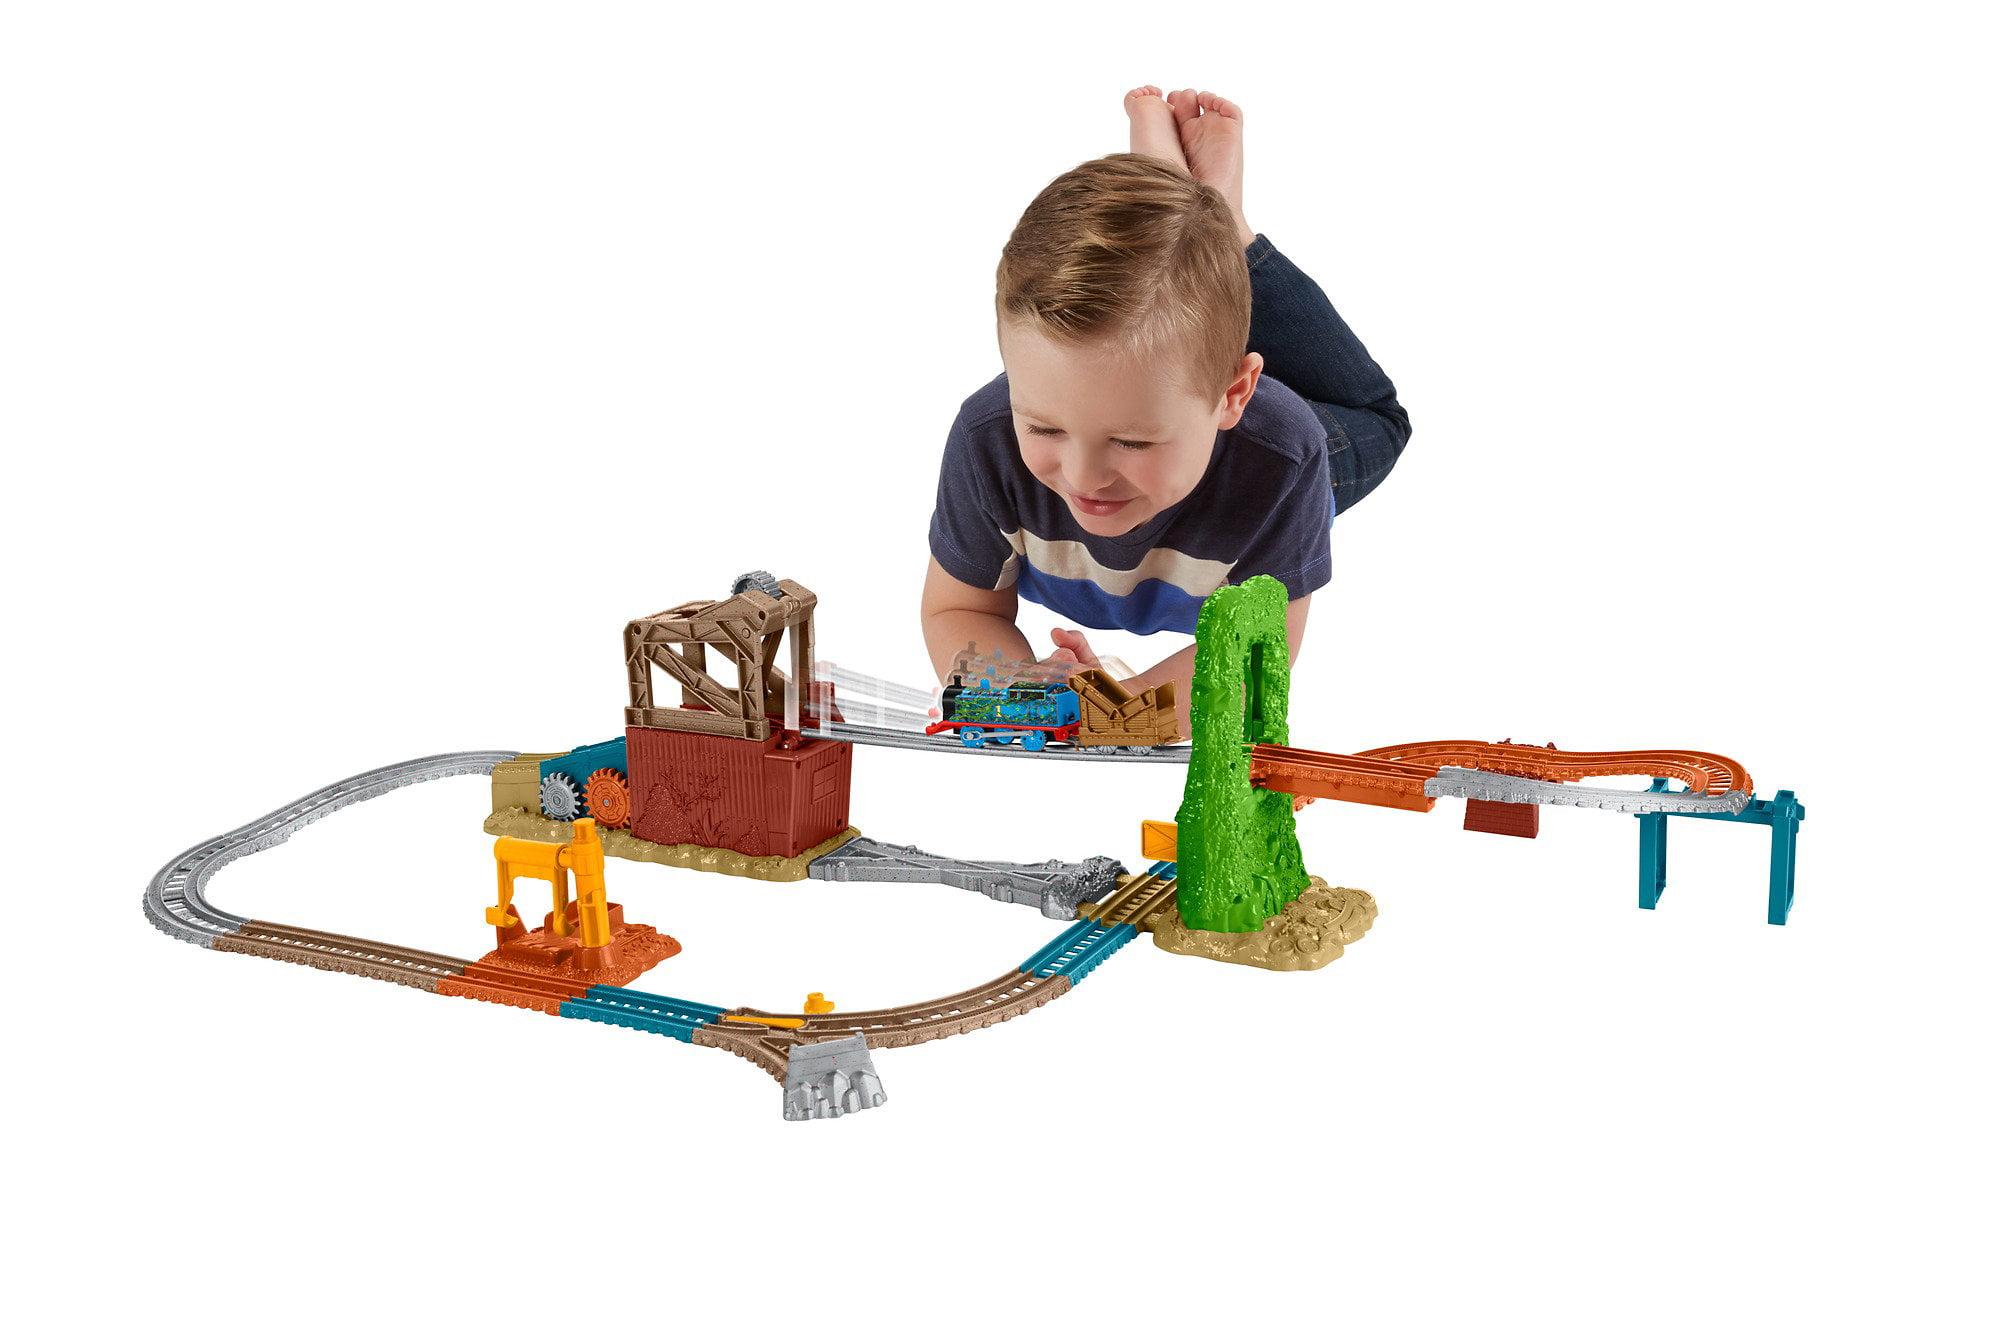 Fisher Price Thomas & Friends Trackmaster Scrapyard Escape Set by Mattel